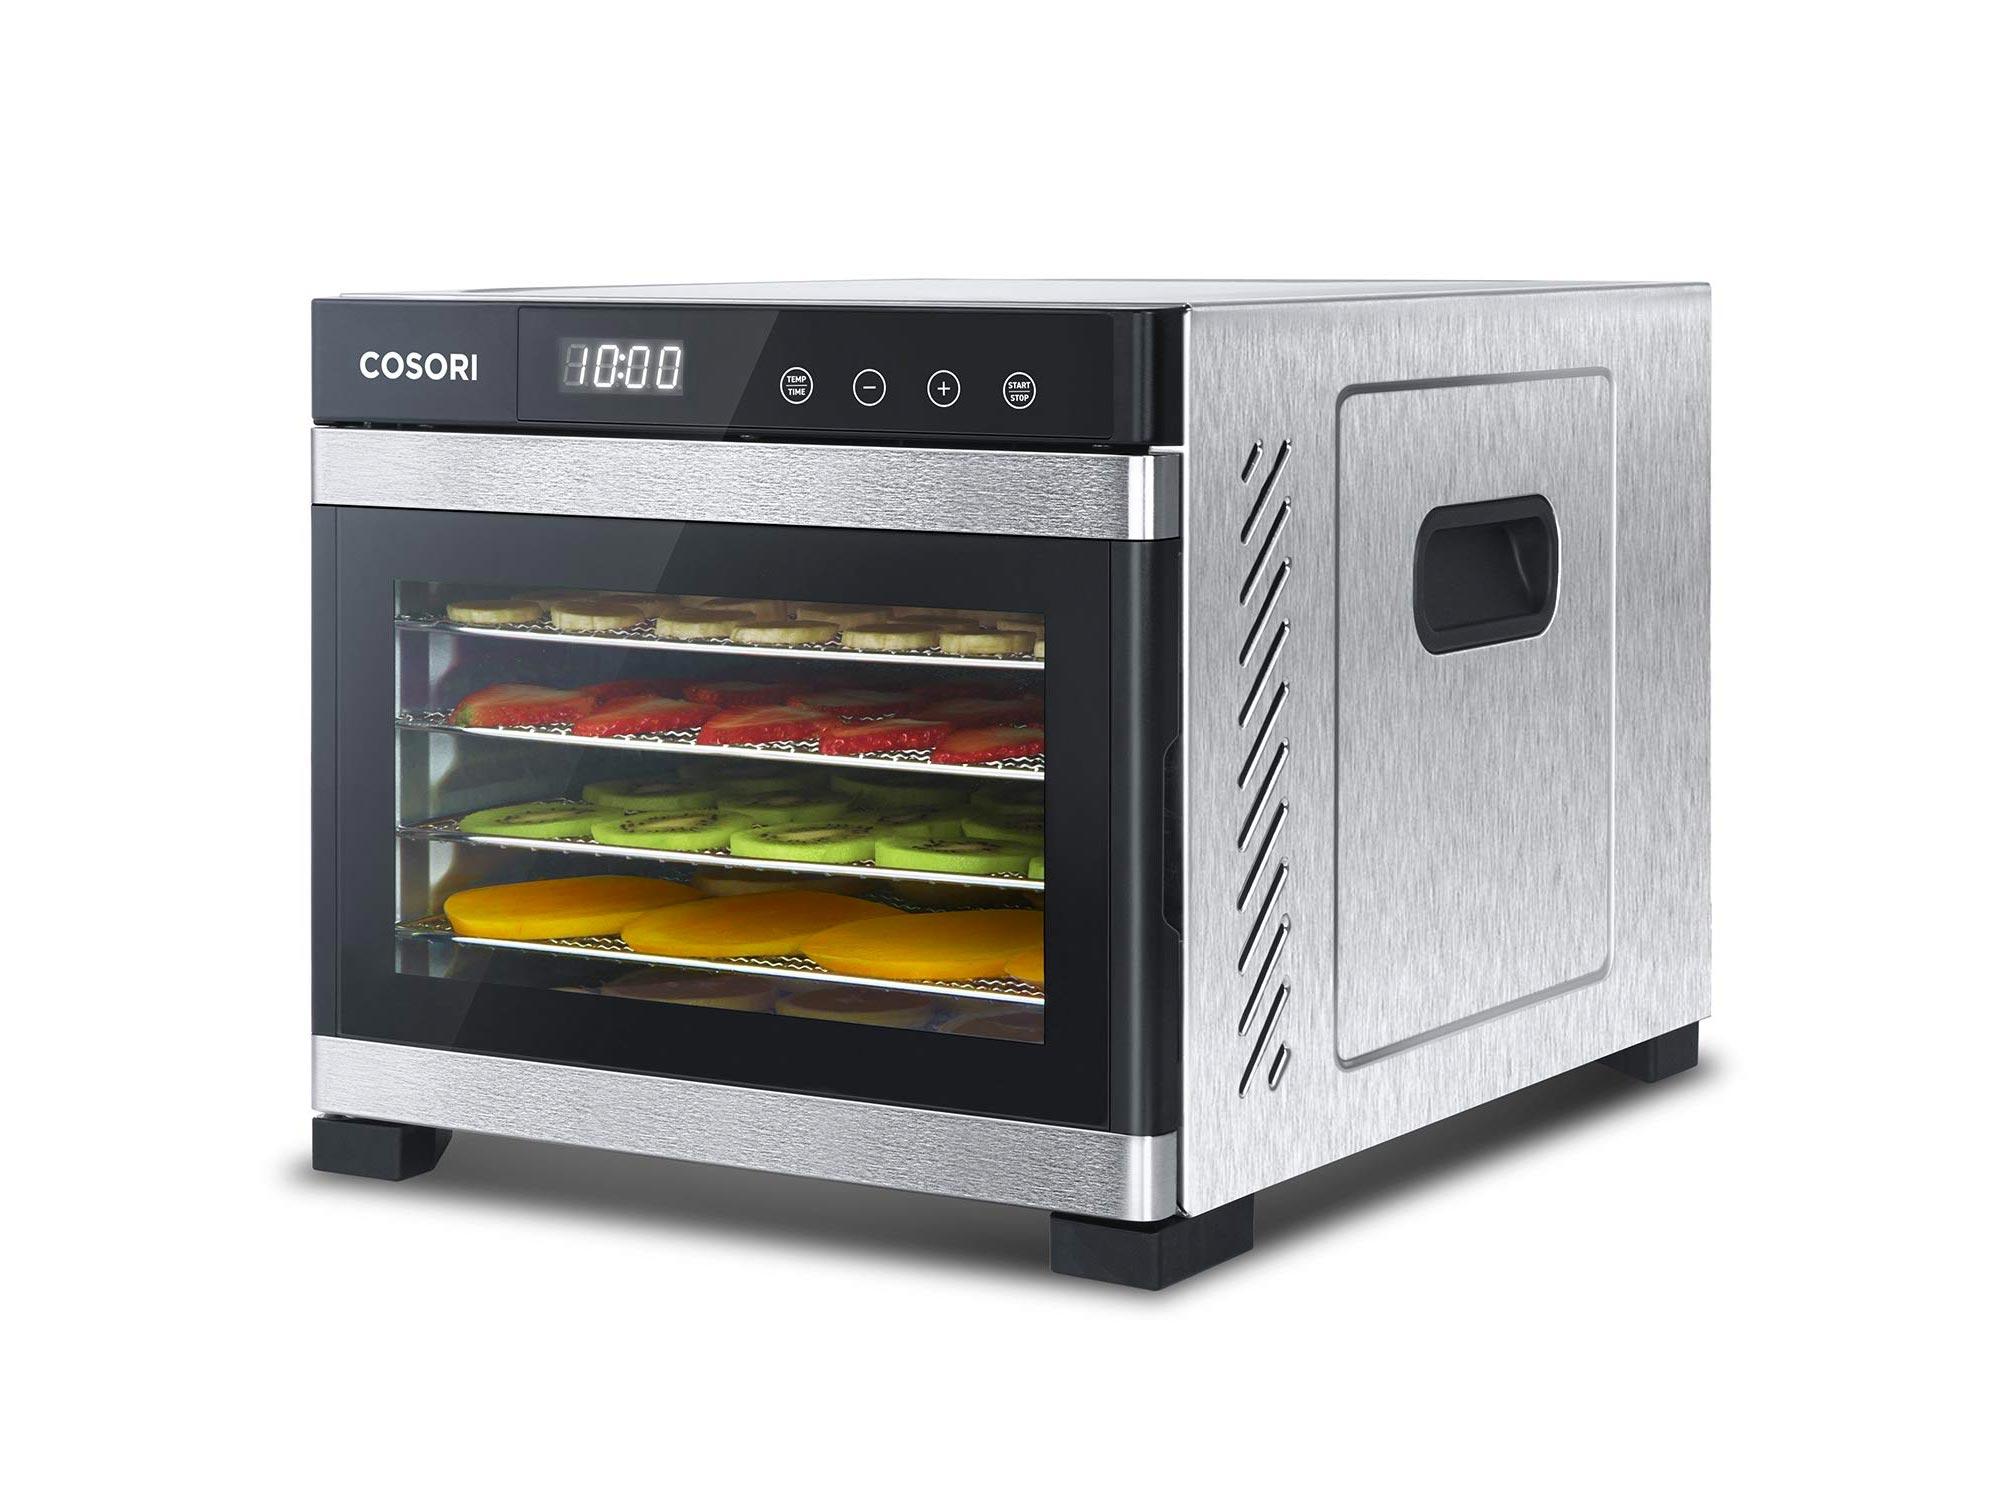 COSORI Premium Food Dehydrator Machine